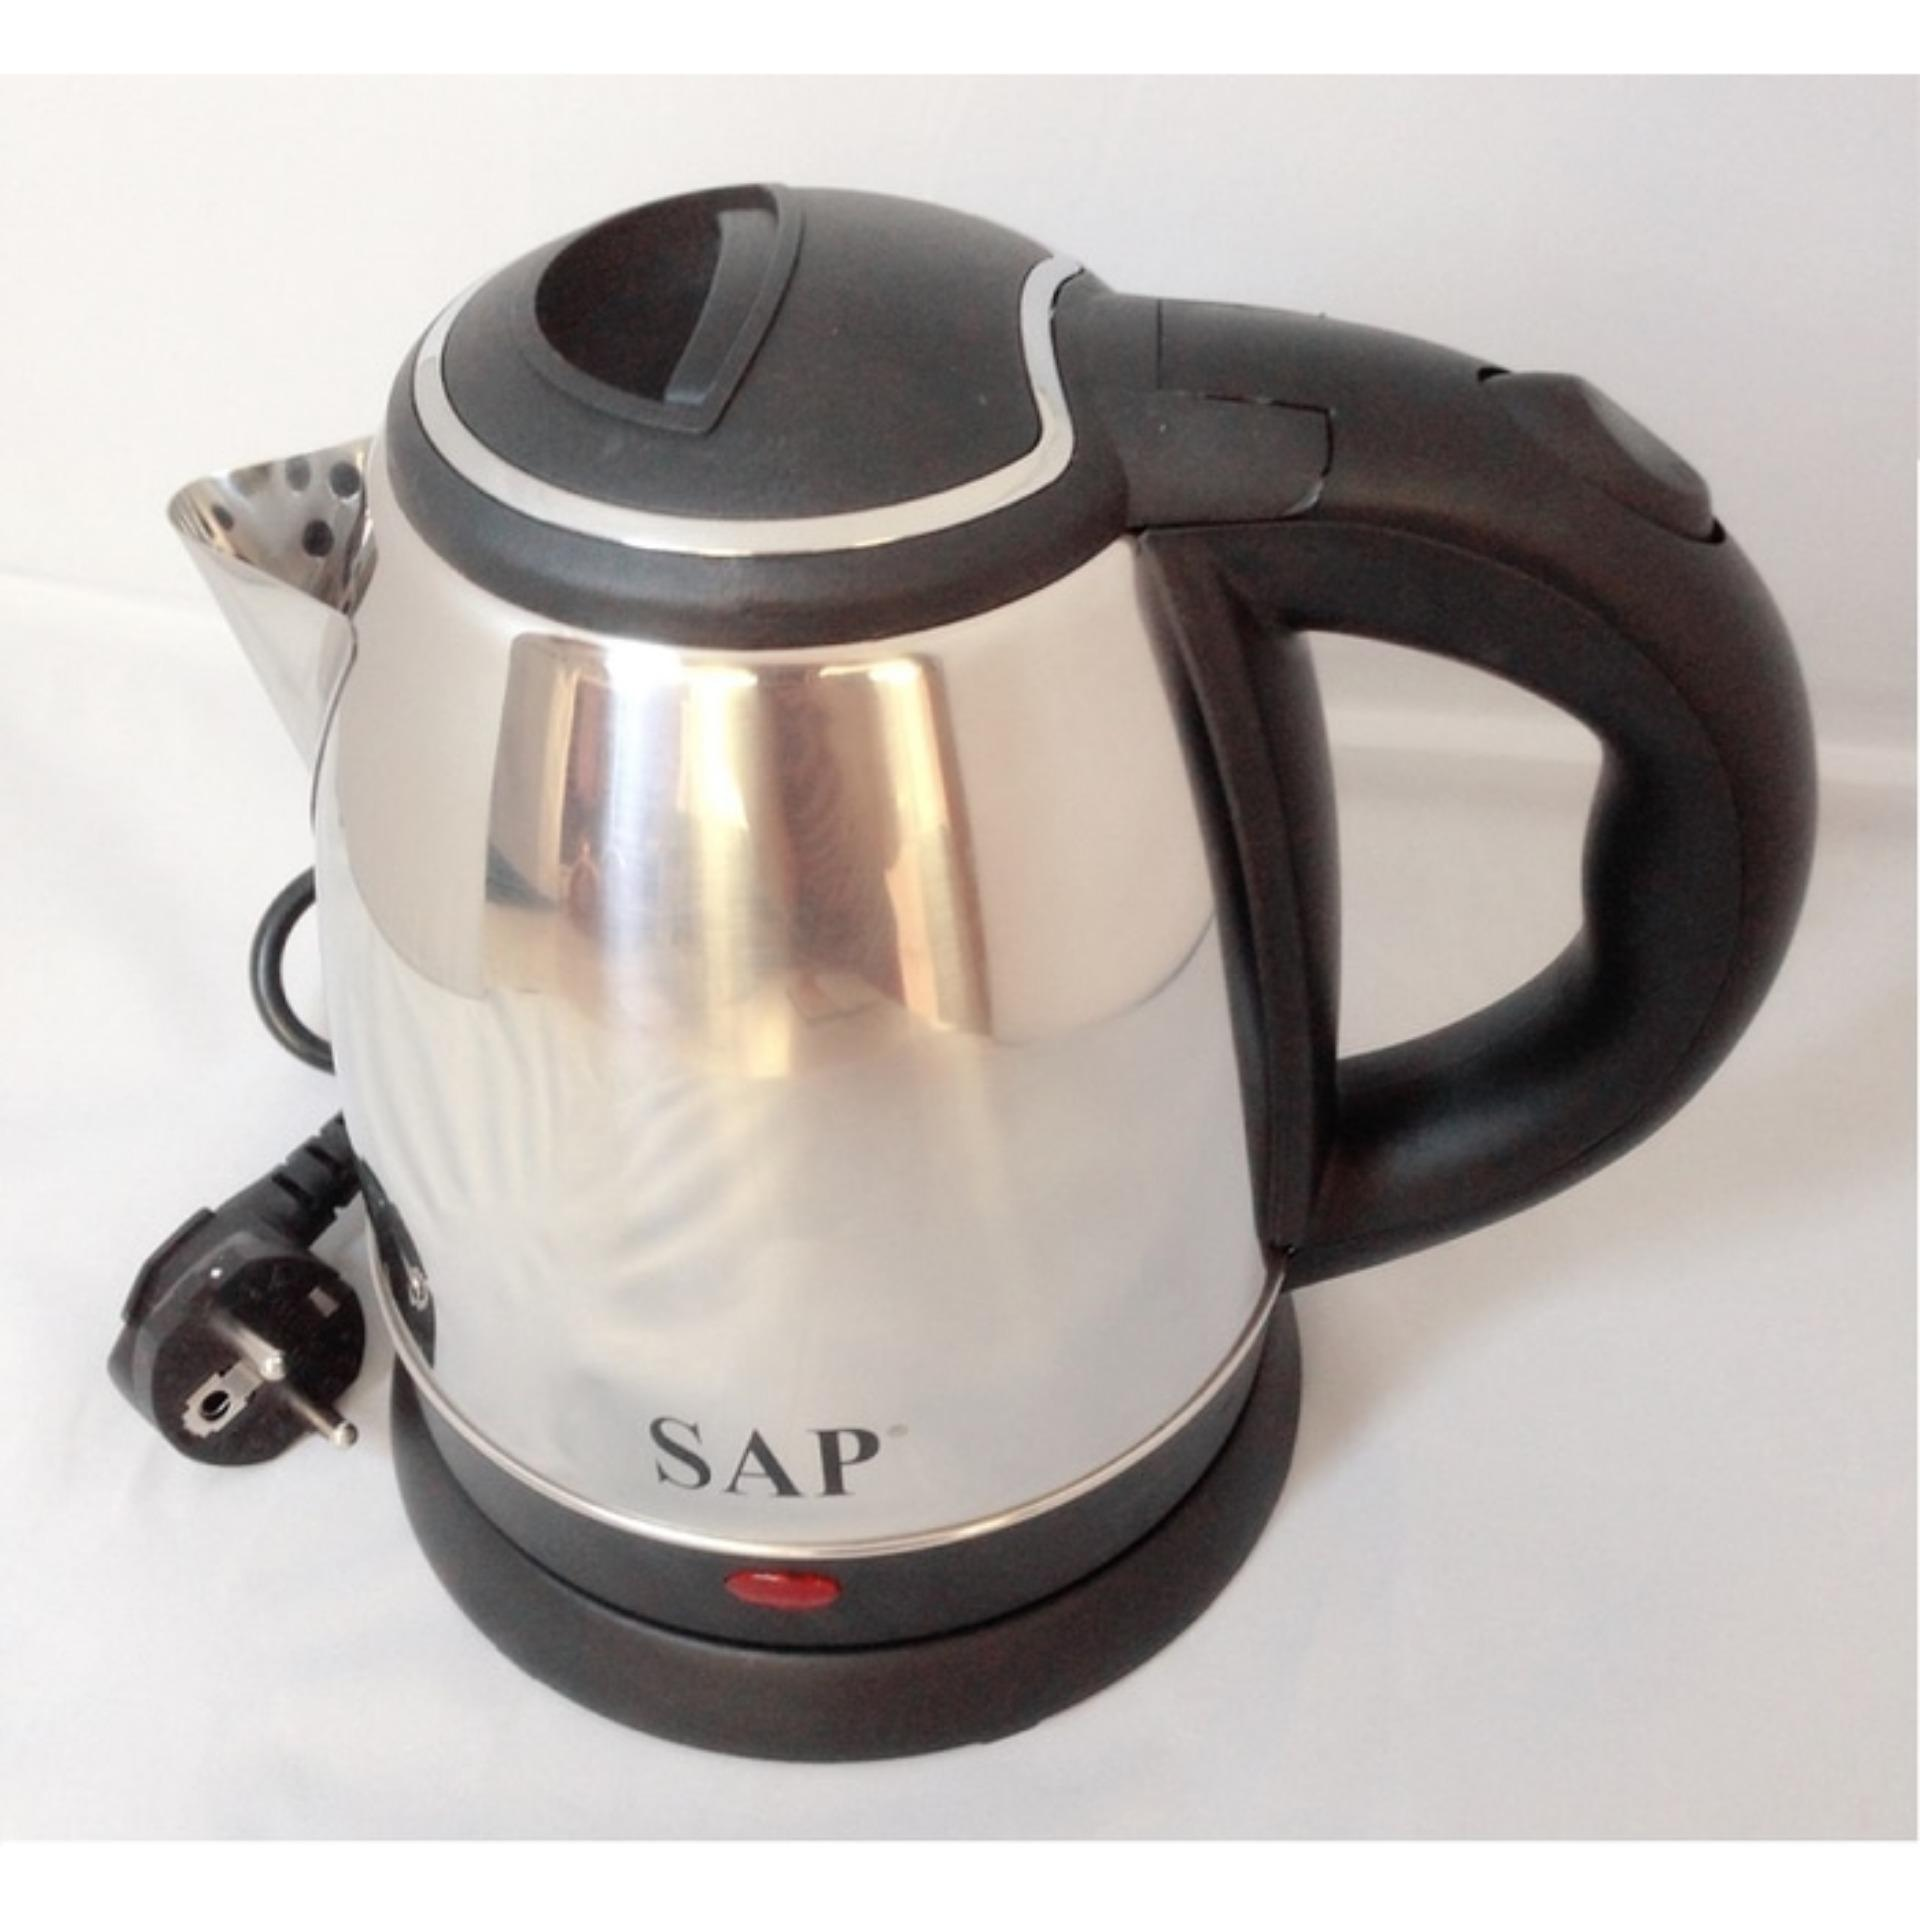 UTEL - SAP Kettle Listrik Stainless Low Watt 1 Ltr SAP-899 - Silver